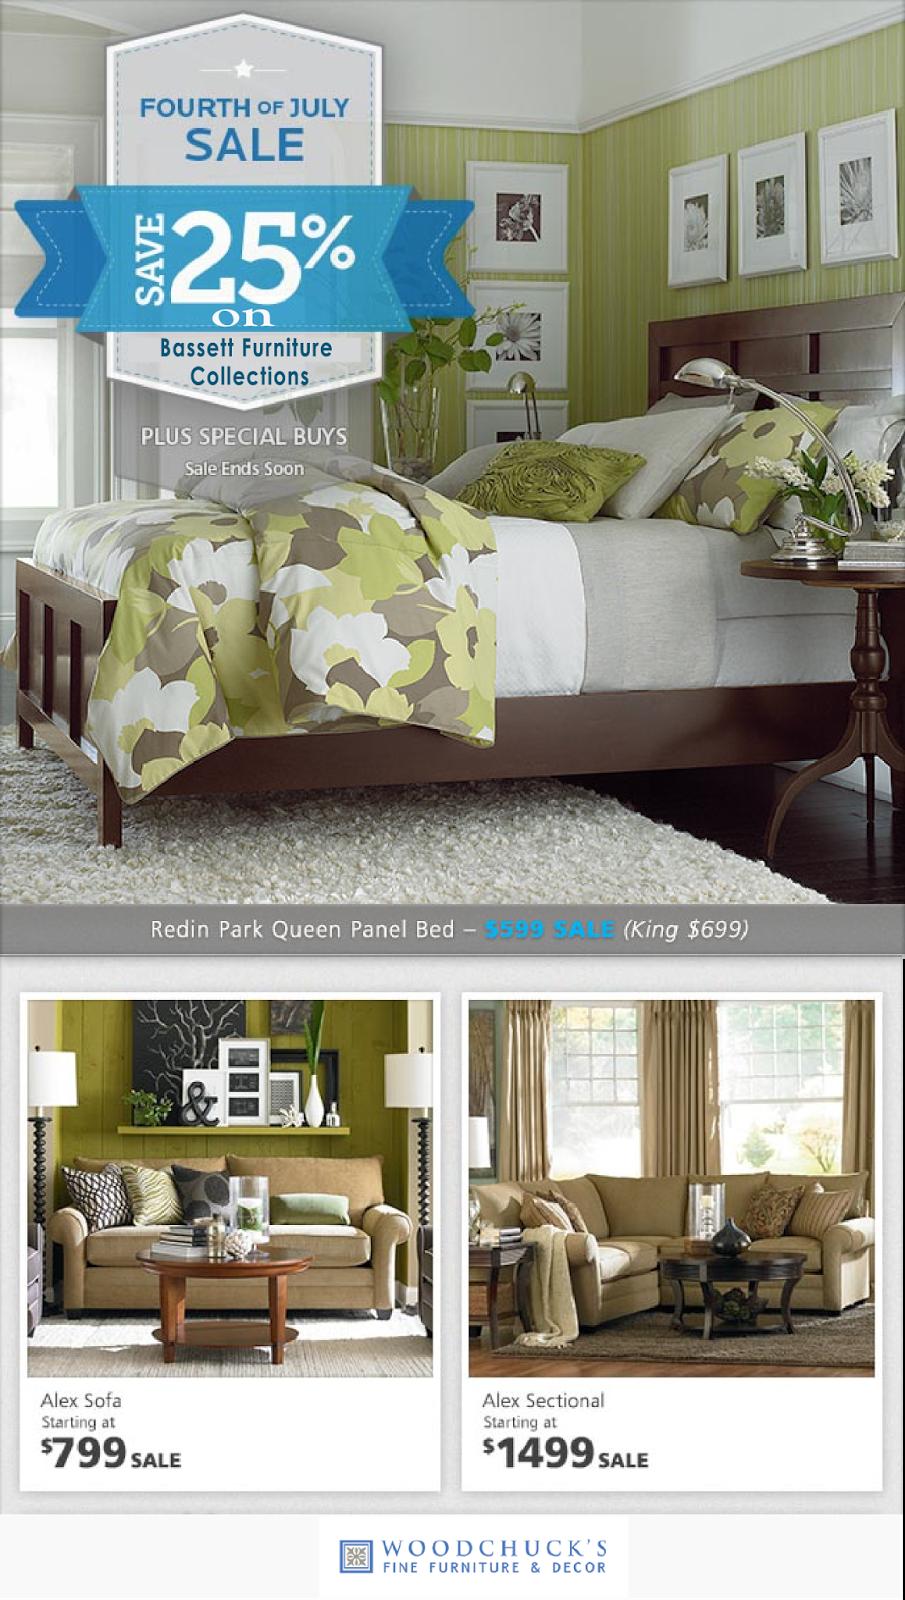 Woodchucku0027s Fine Furniture And Decor